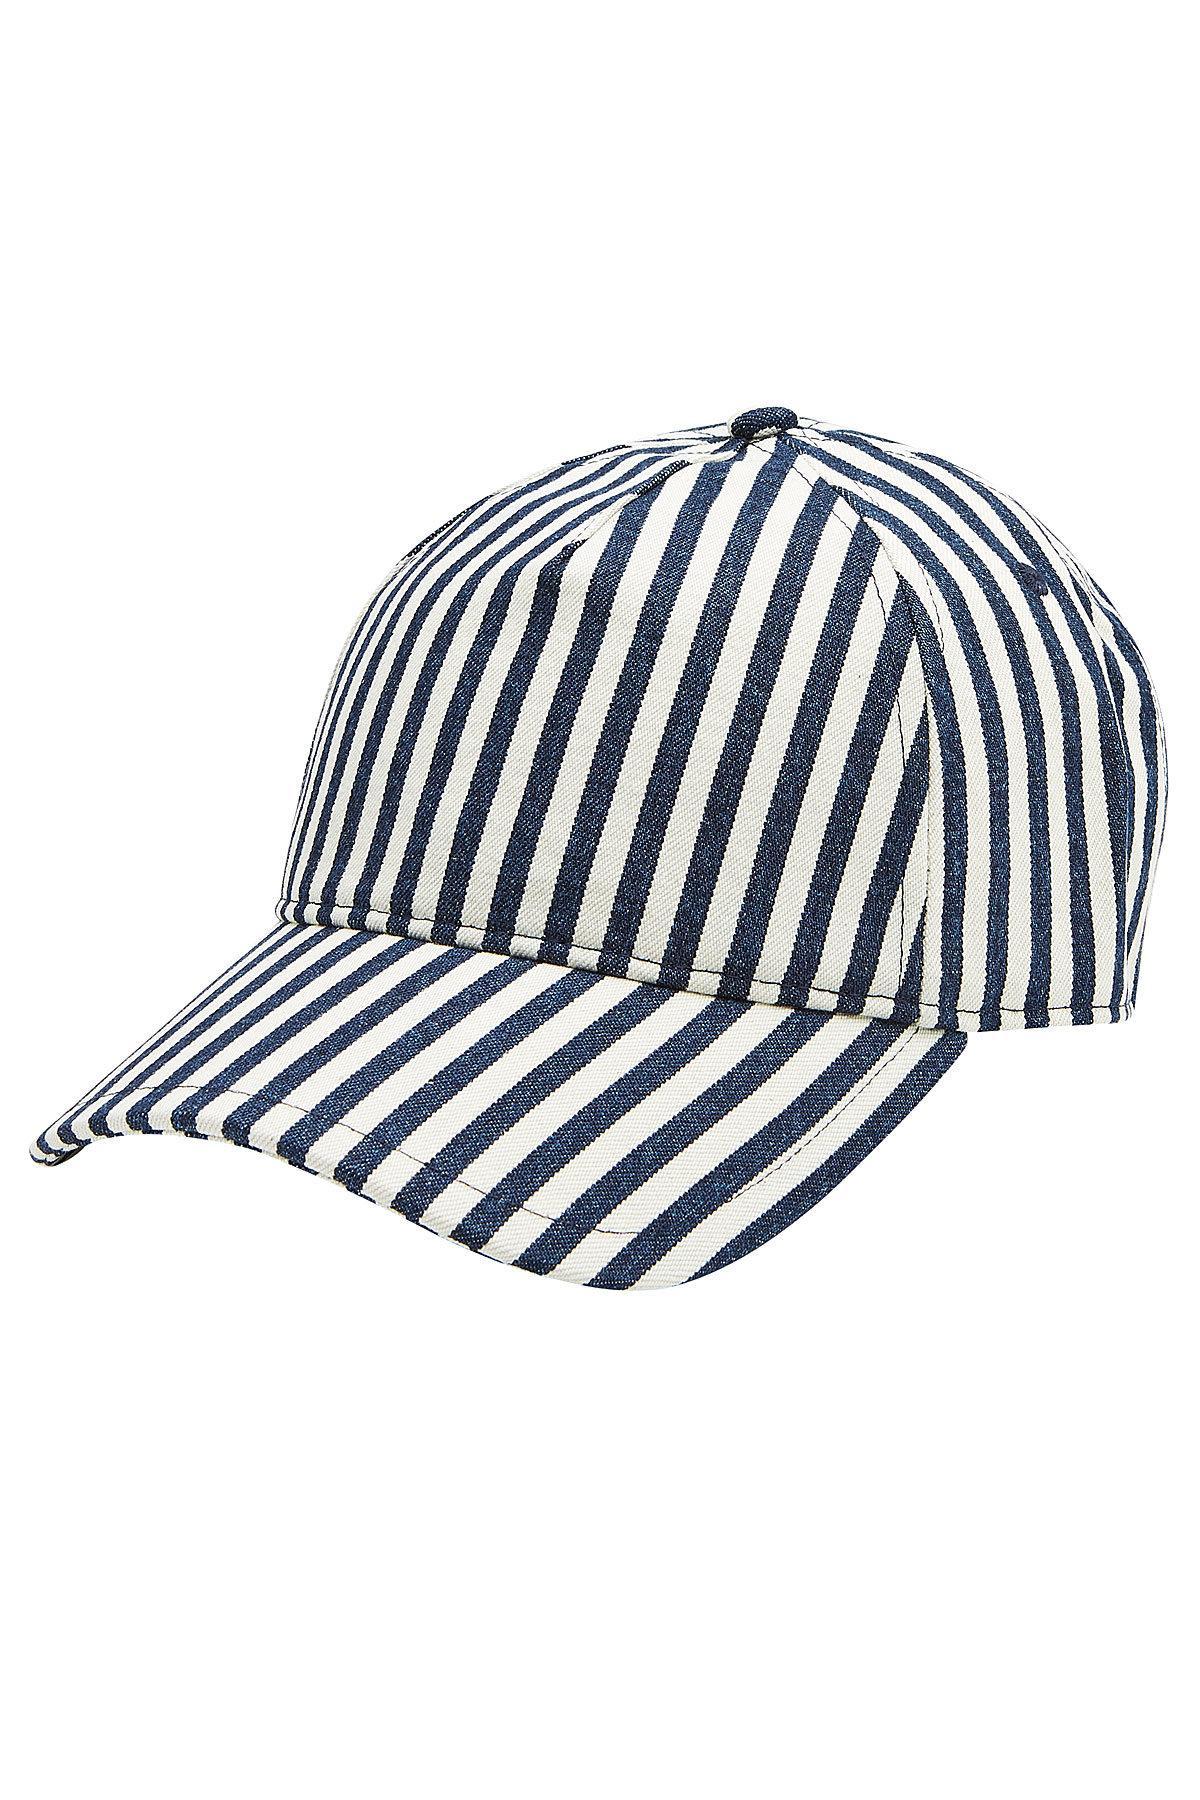 9a0a9a7bce278 Rag   Bone Marilyn Leather-Trimmed Striped Denim Baseball Cap In Navy